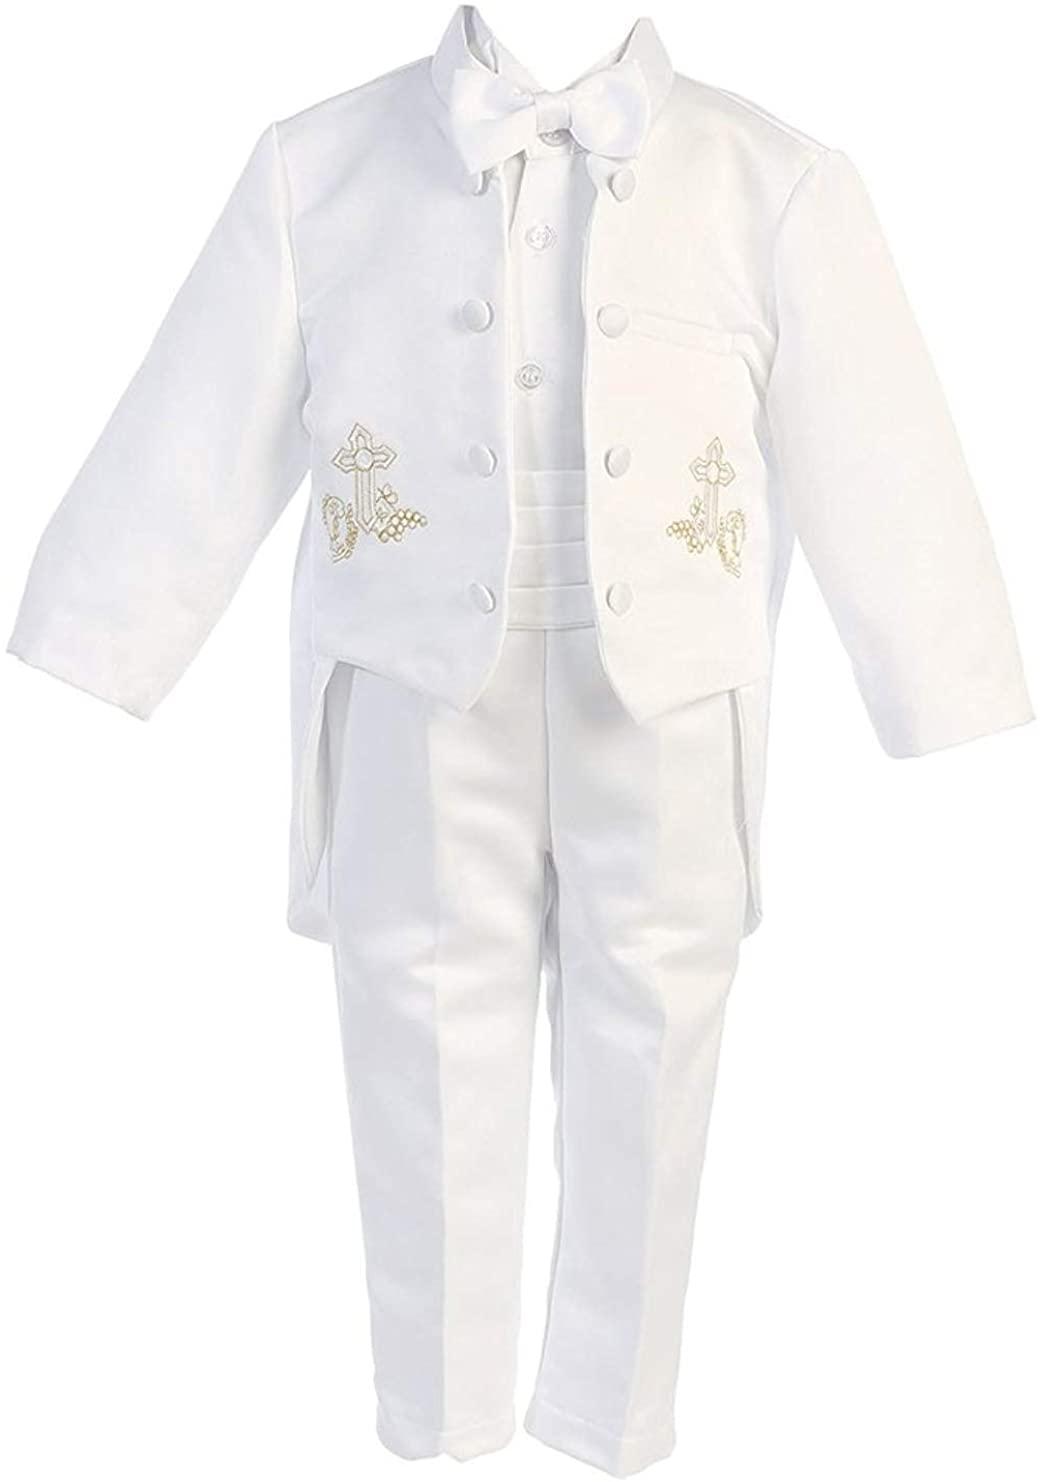 iGilrDress Baby/Toddler/Boys White Baptism Christening Mandarin Collar Tail 5 pcs Tuxedo with Cross Embroidery